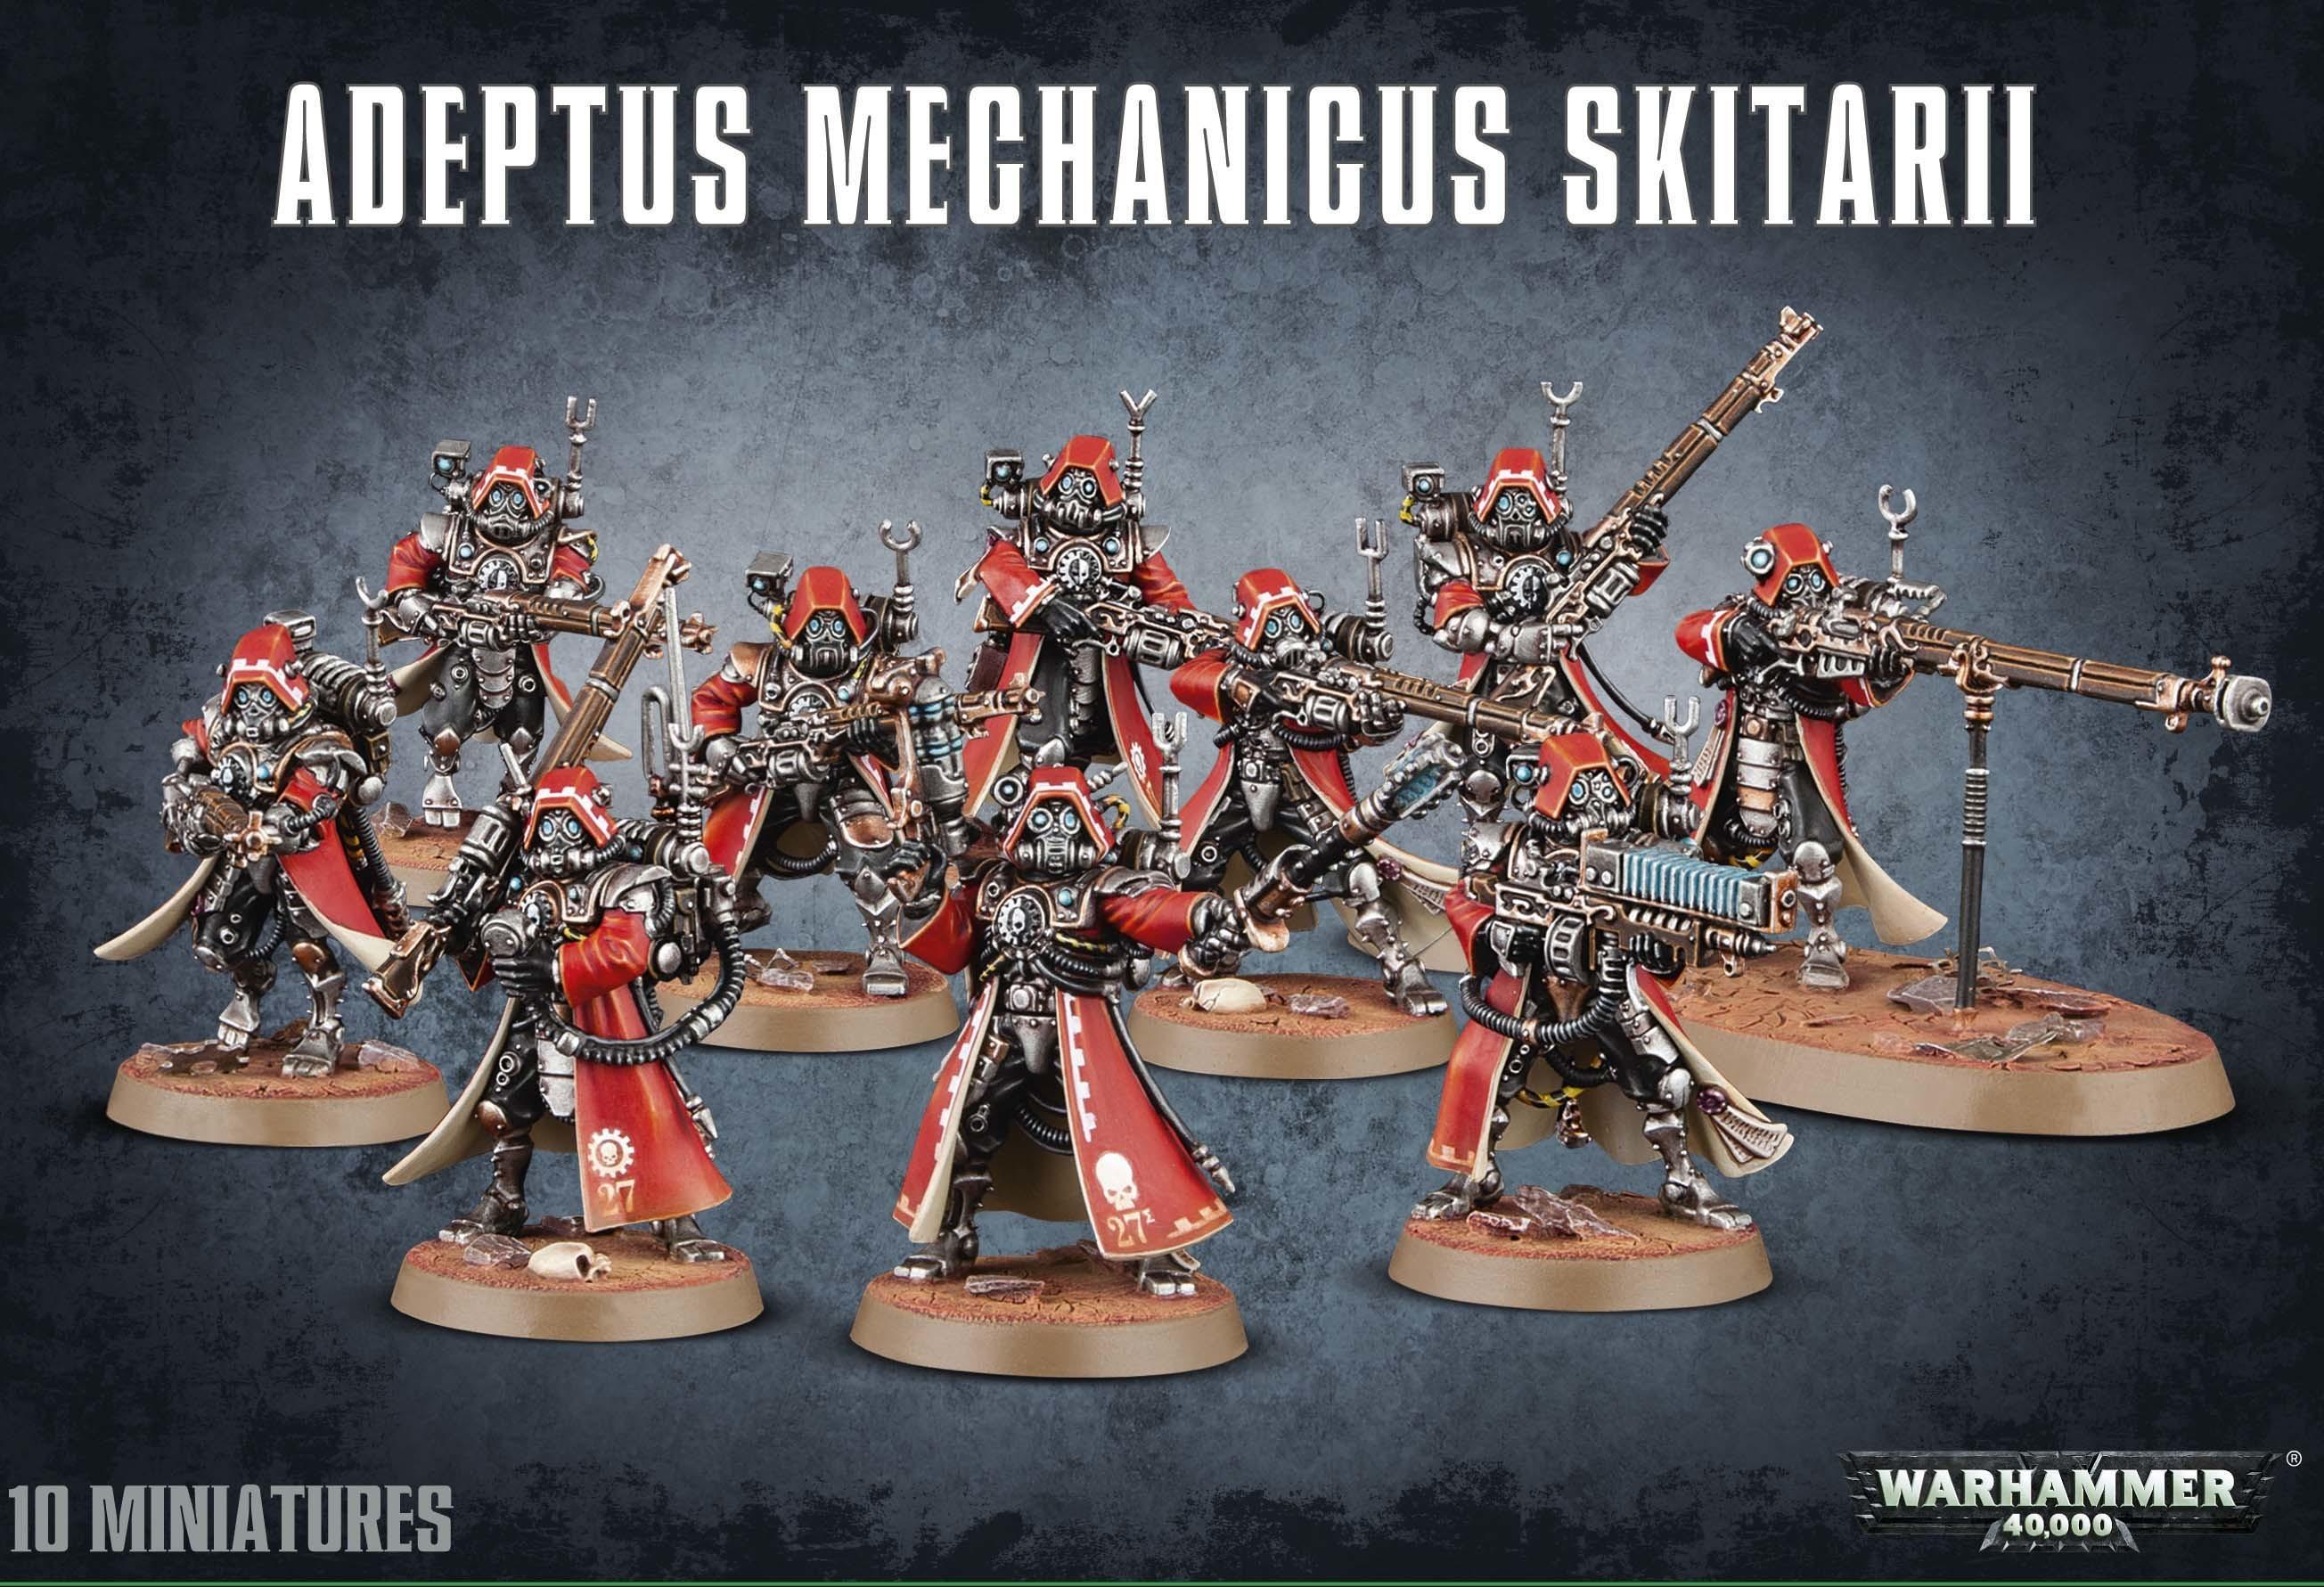 ADEPTUS MECHANICUS SKITARII - Warhammer 40.000 - Games Workshop 99120116016